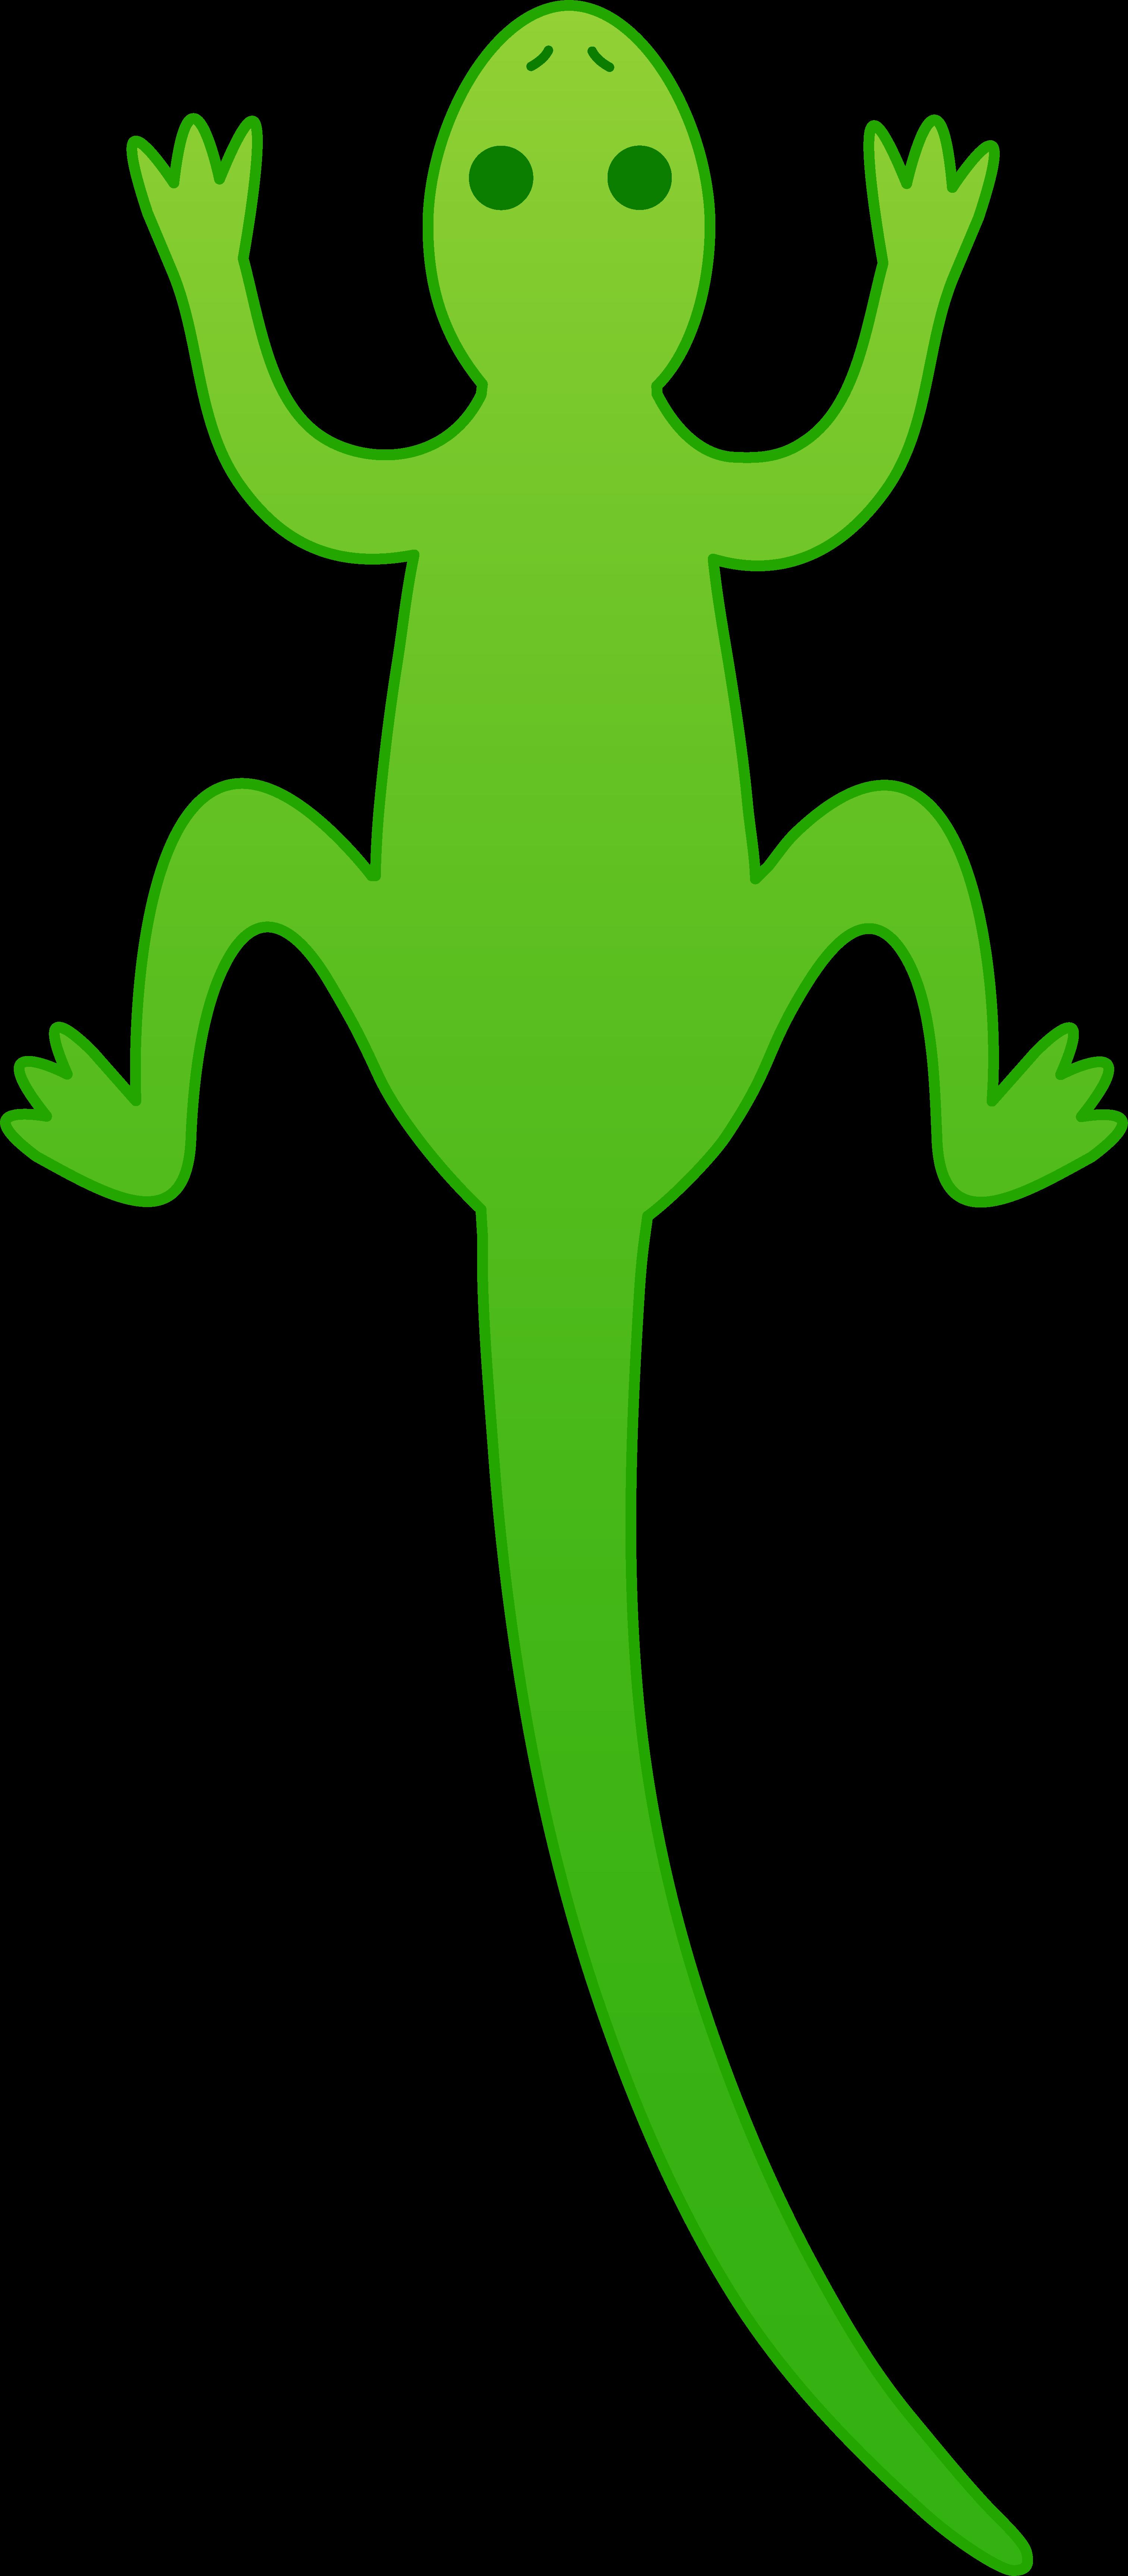 Clip free on dumielauxepices. Gecko clipart cicak